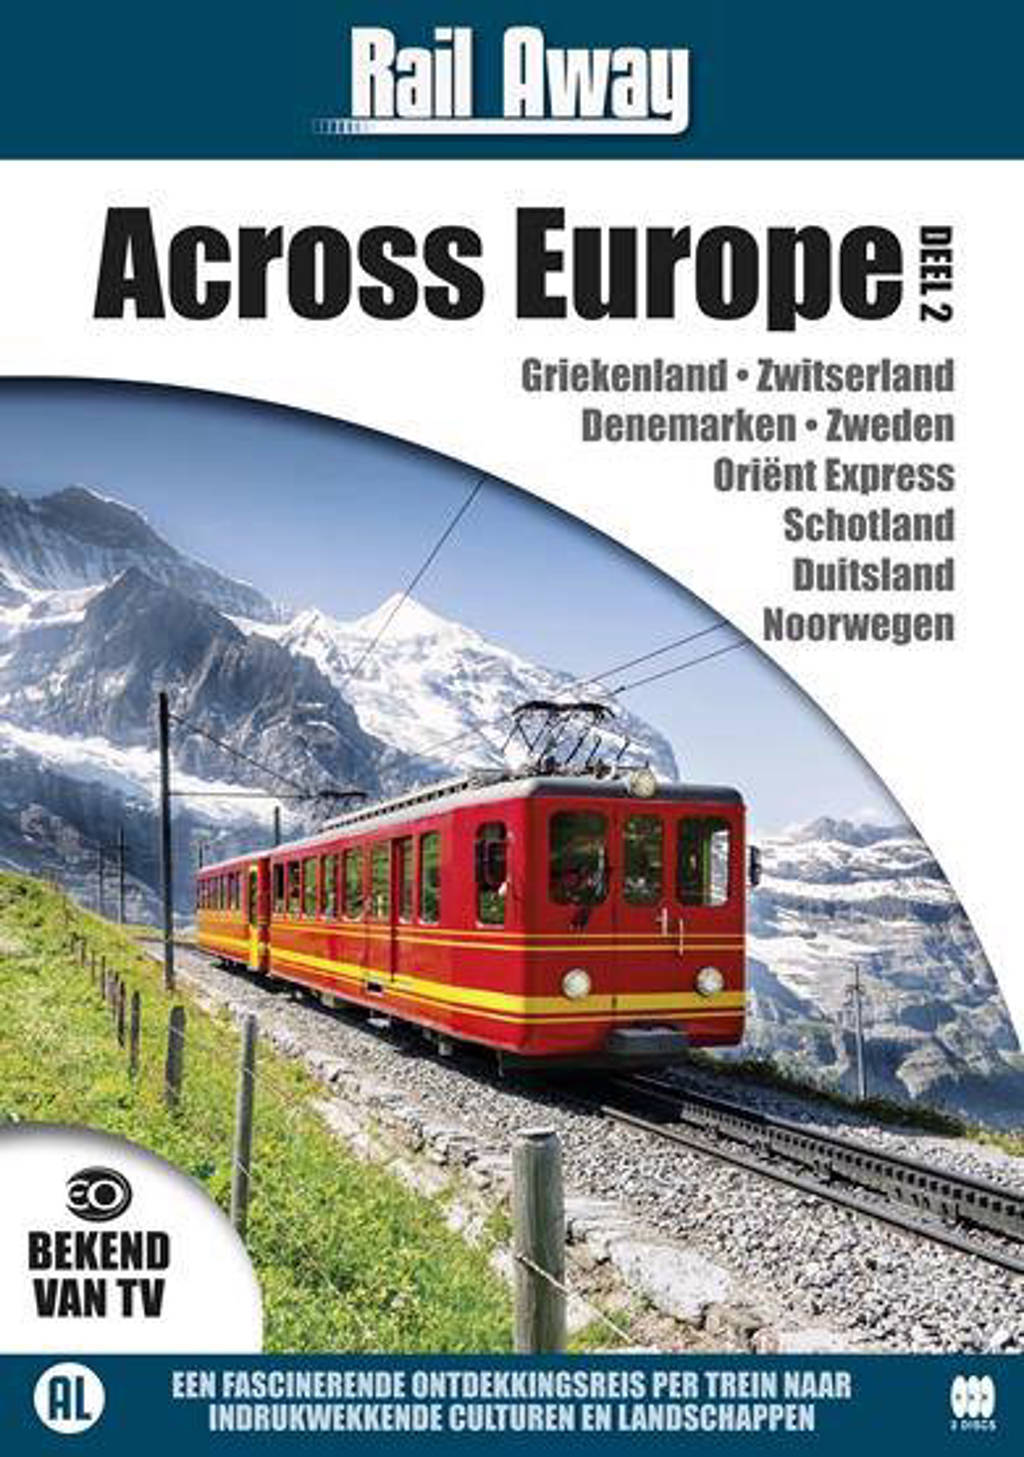 Rail away across Europe 2 (DVD)